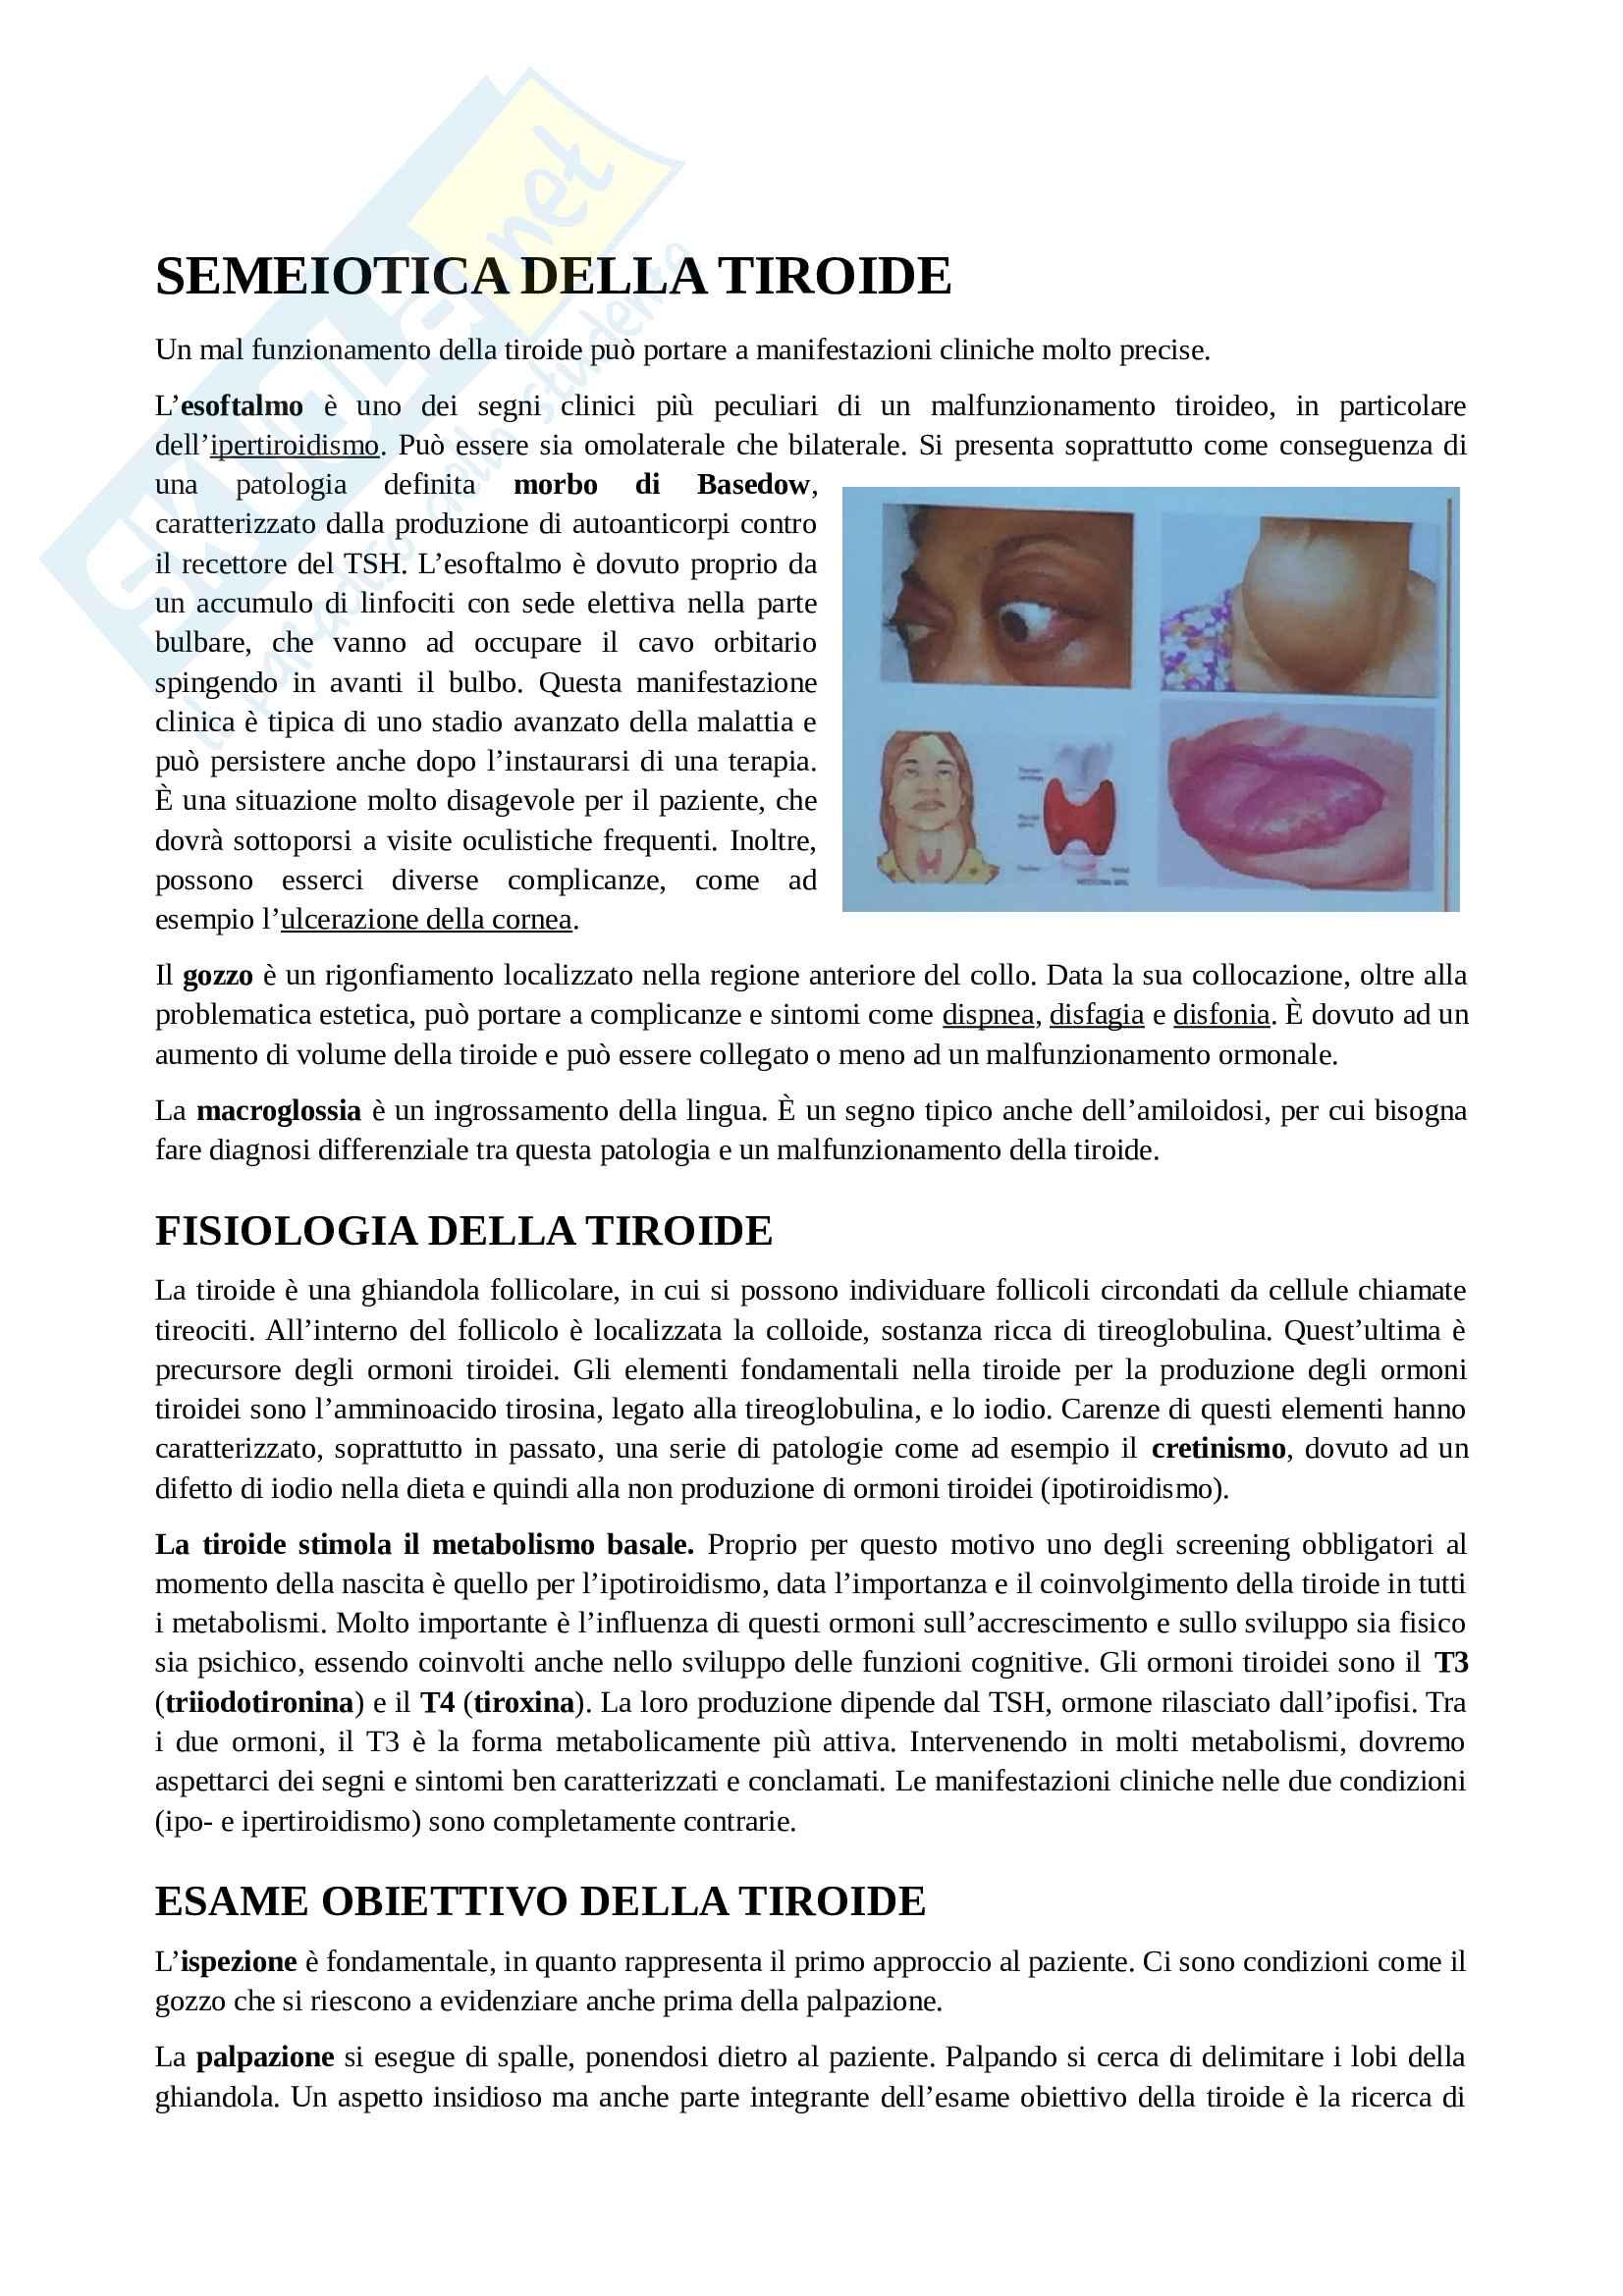 Semeiotica della tiroide